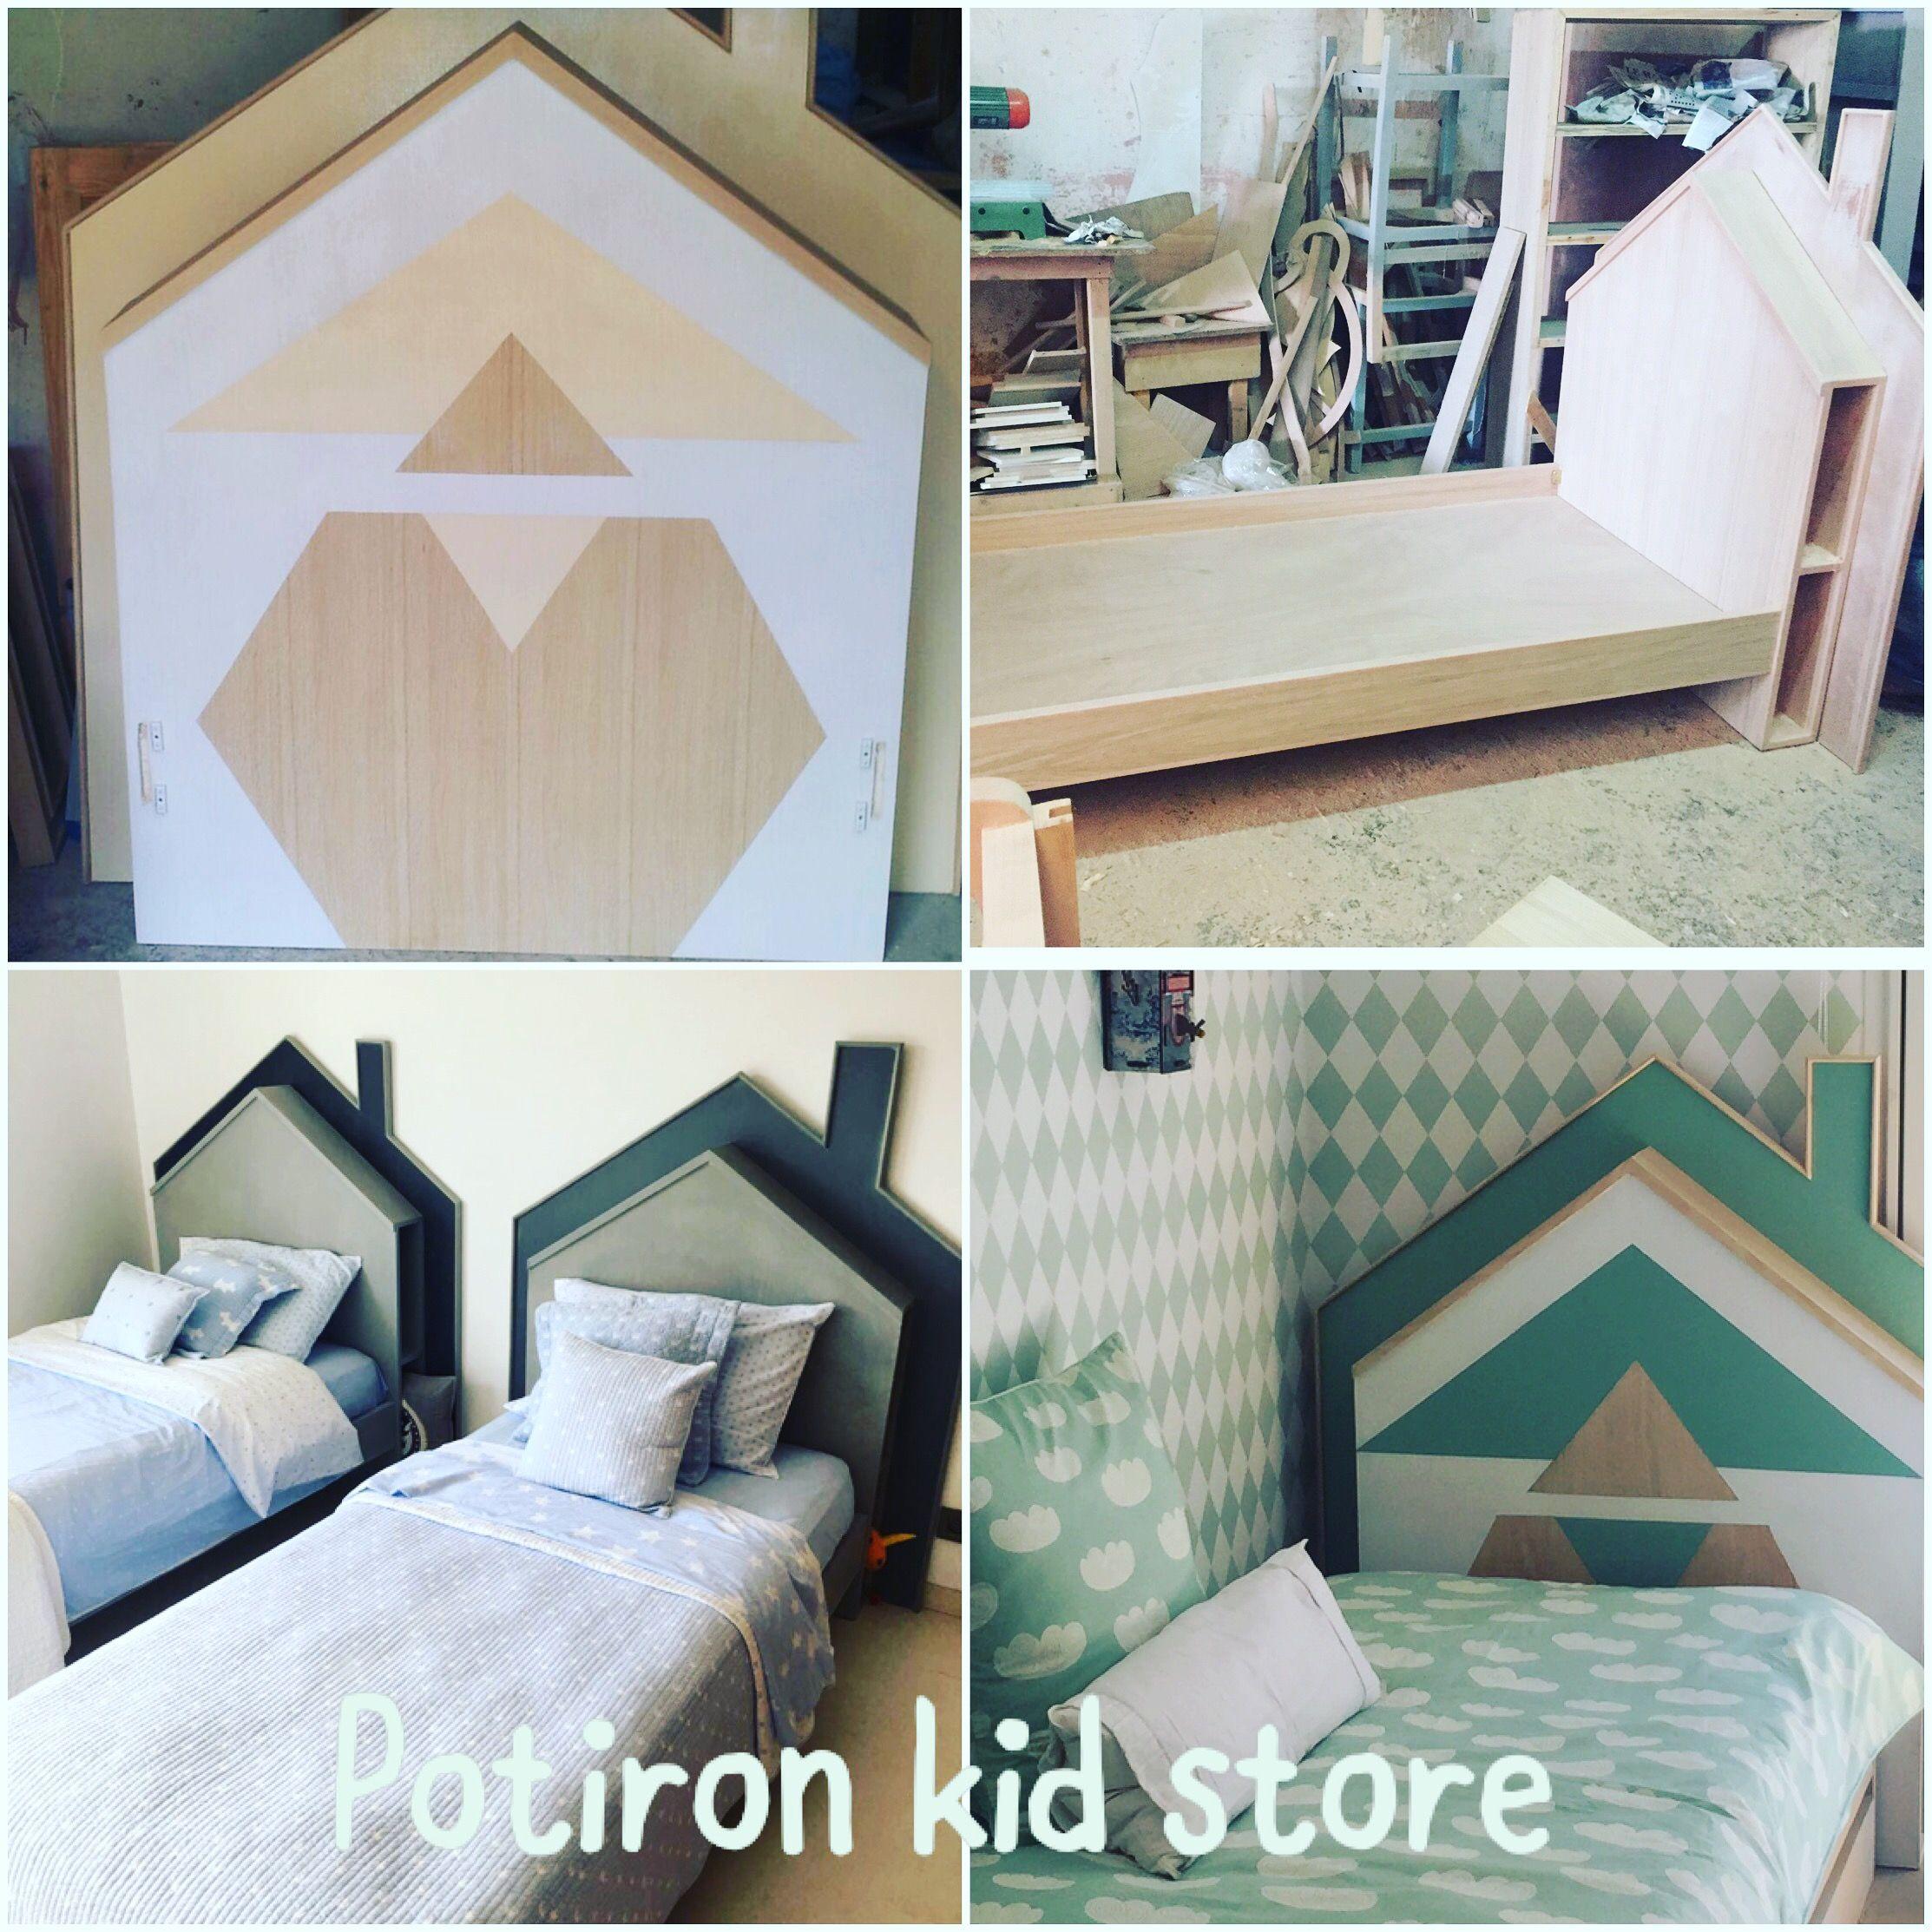 Diy totem by Potiron kid store casablanca Montessori house bed